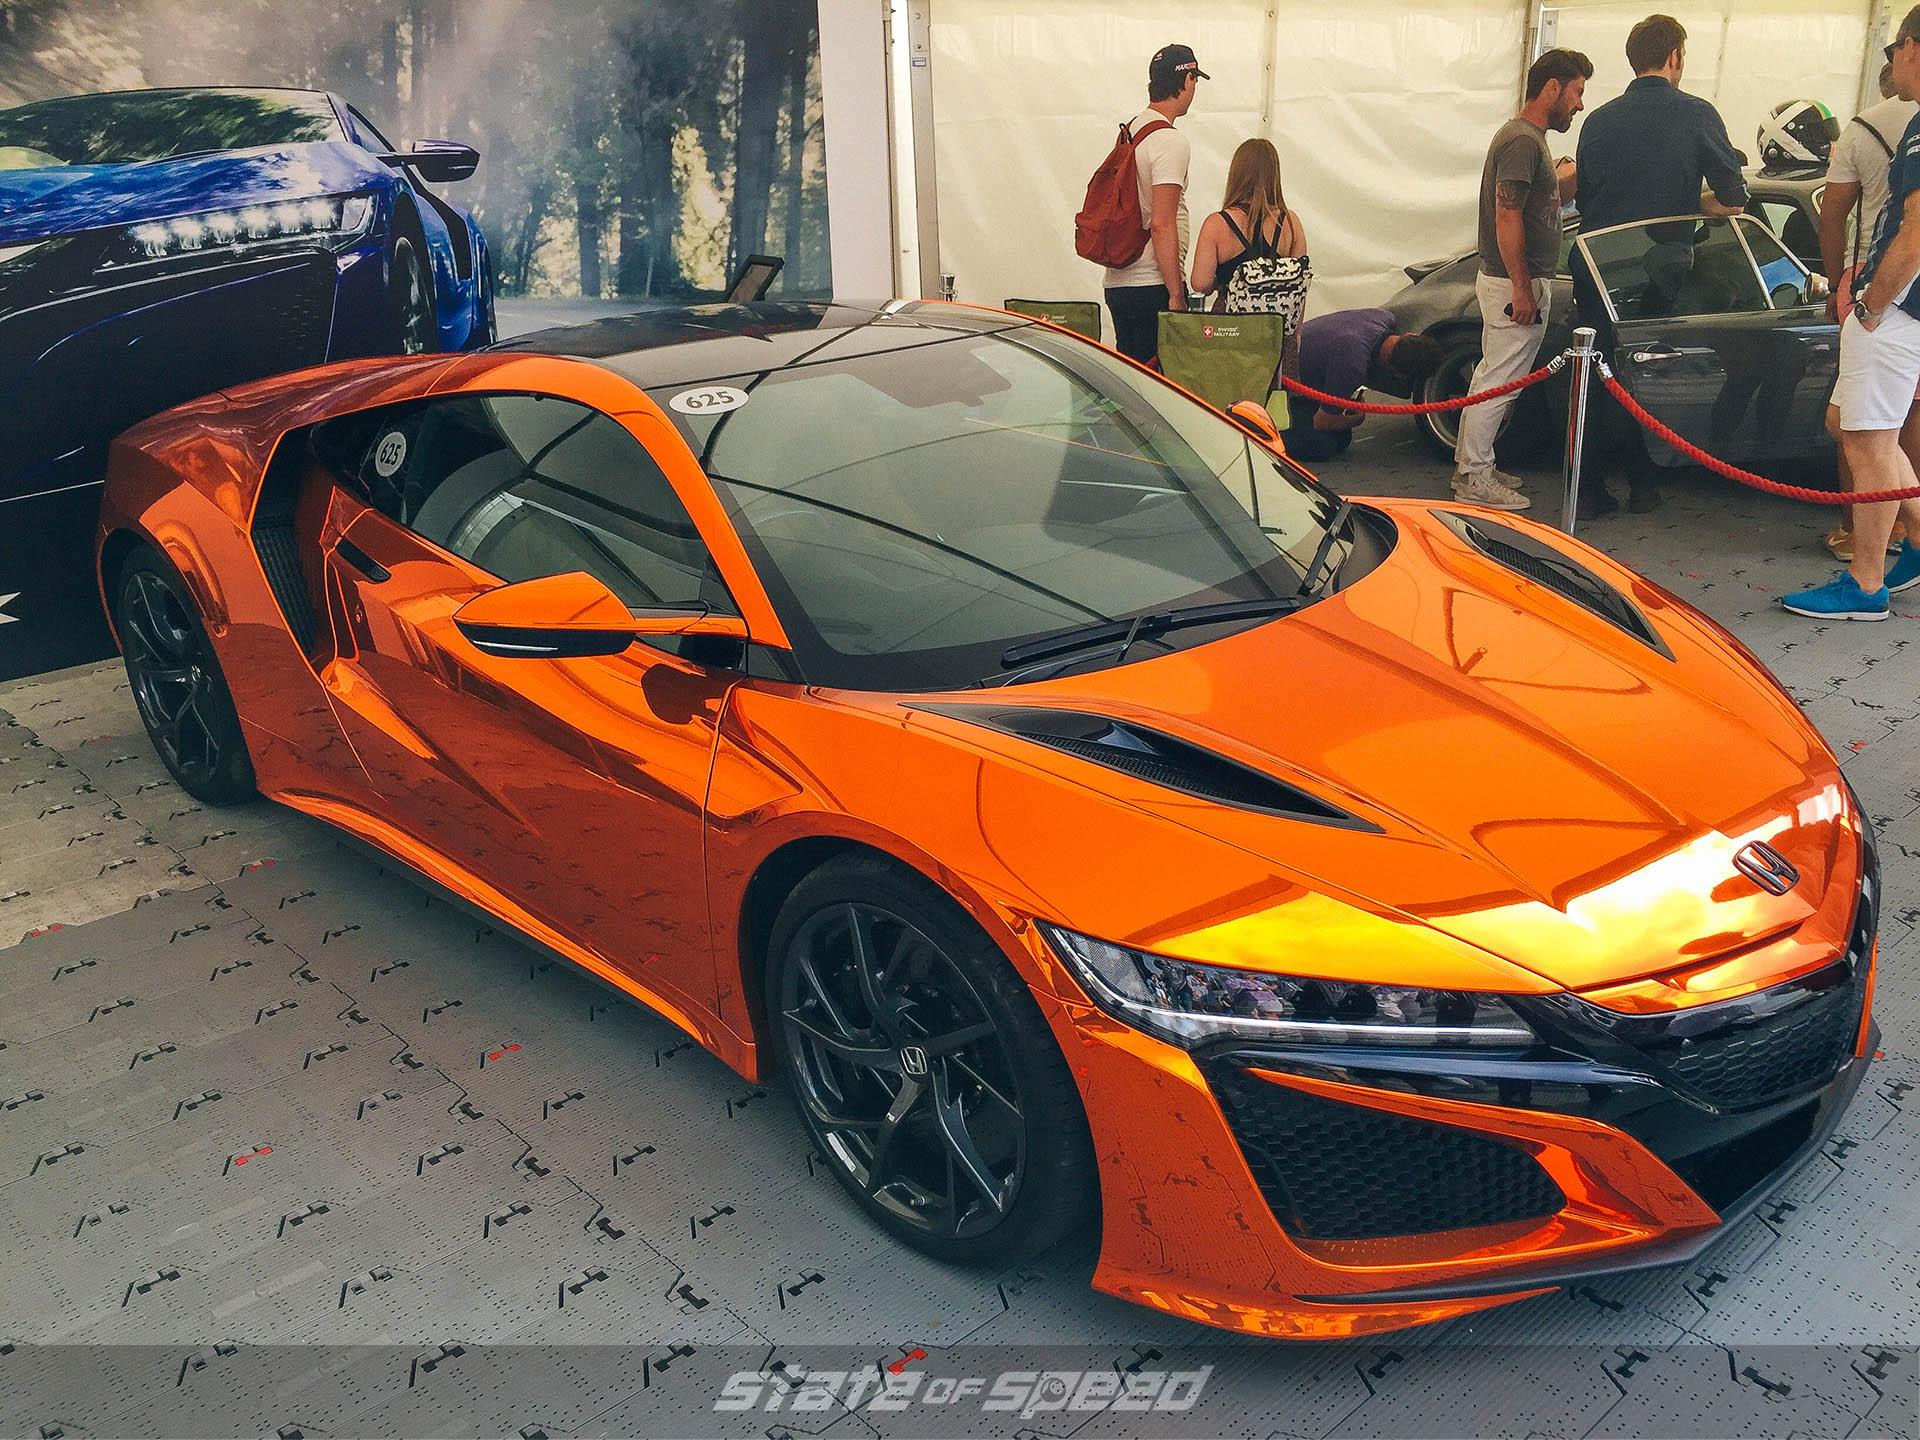 Metallic Orange wrapped NSX at Goodwood festival of speed